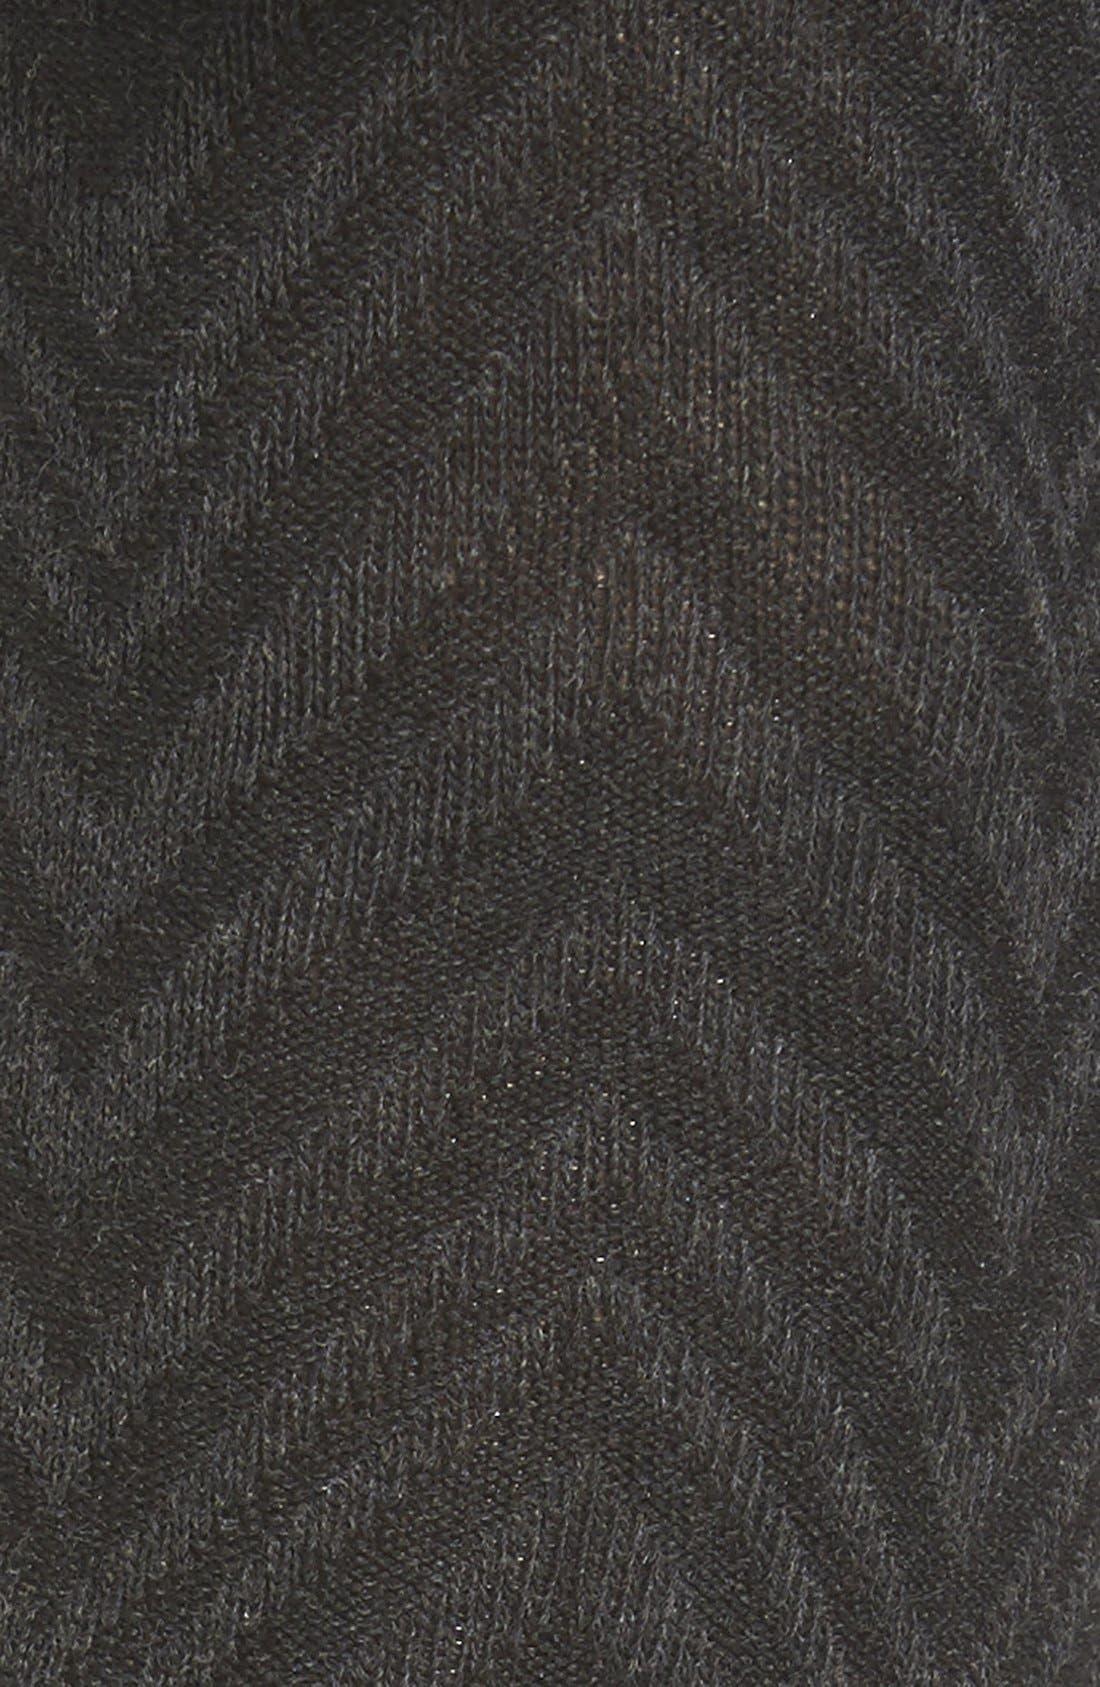 Alternate Image 2  - Hue Chevron Stripe Tights with Stirrup Straps